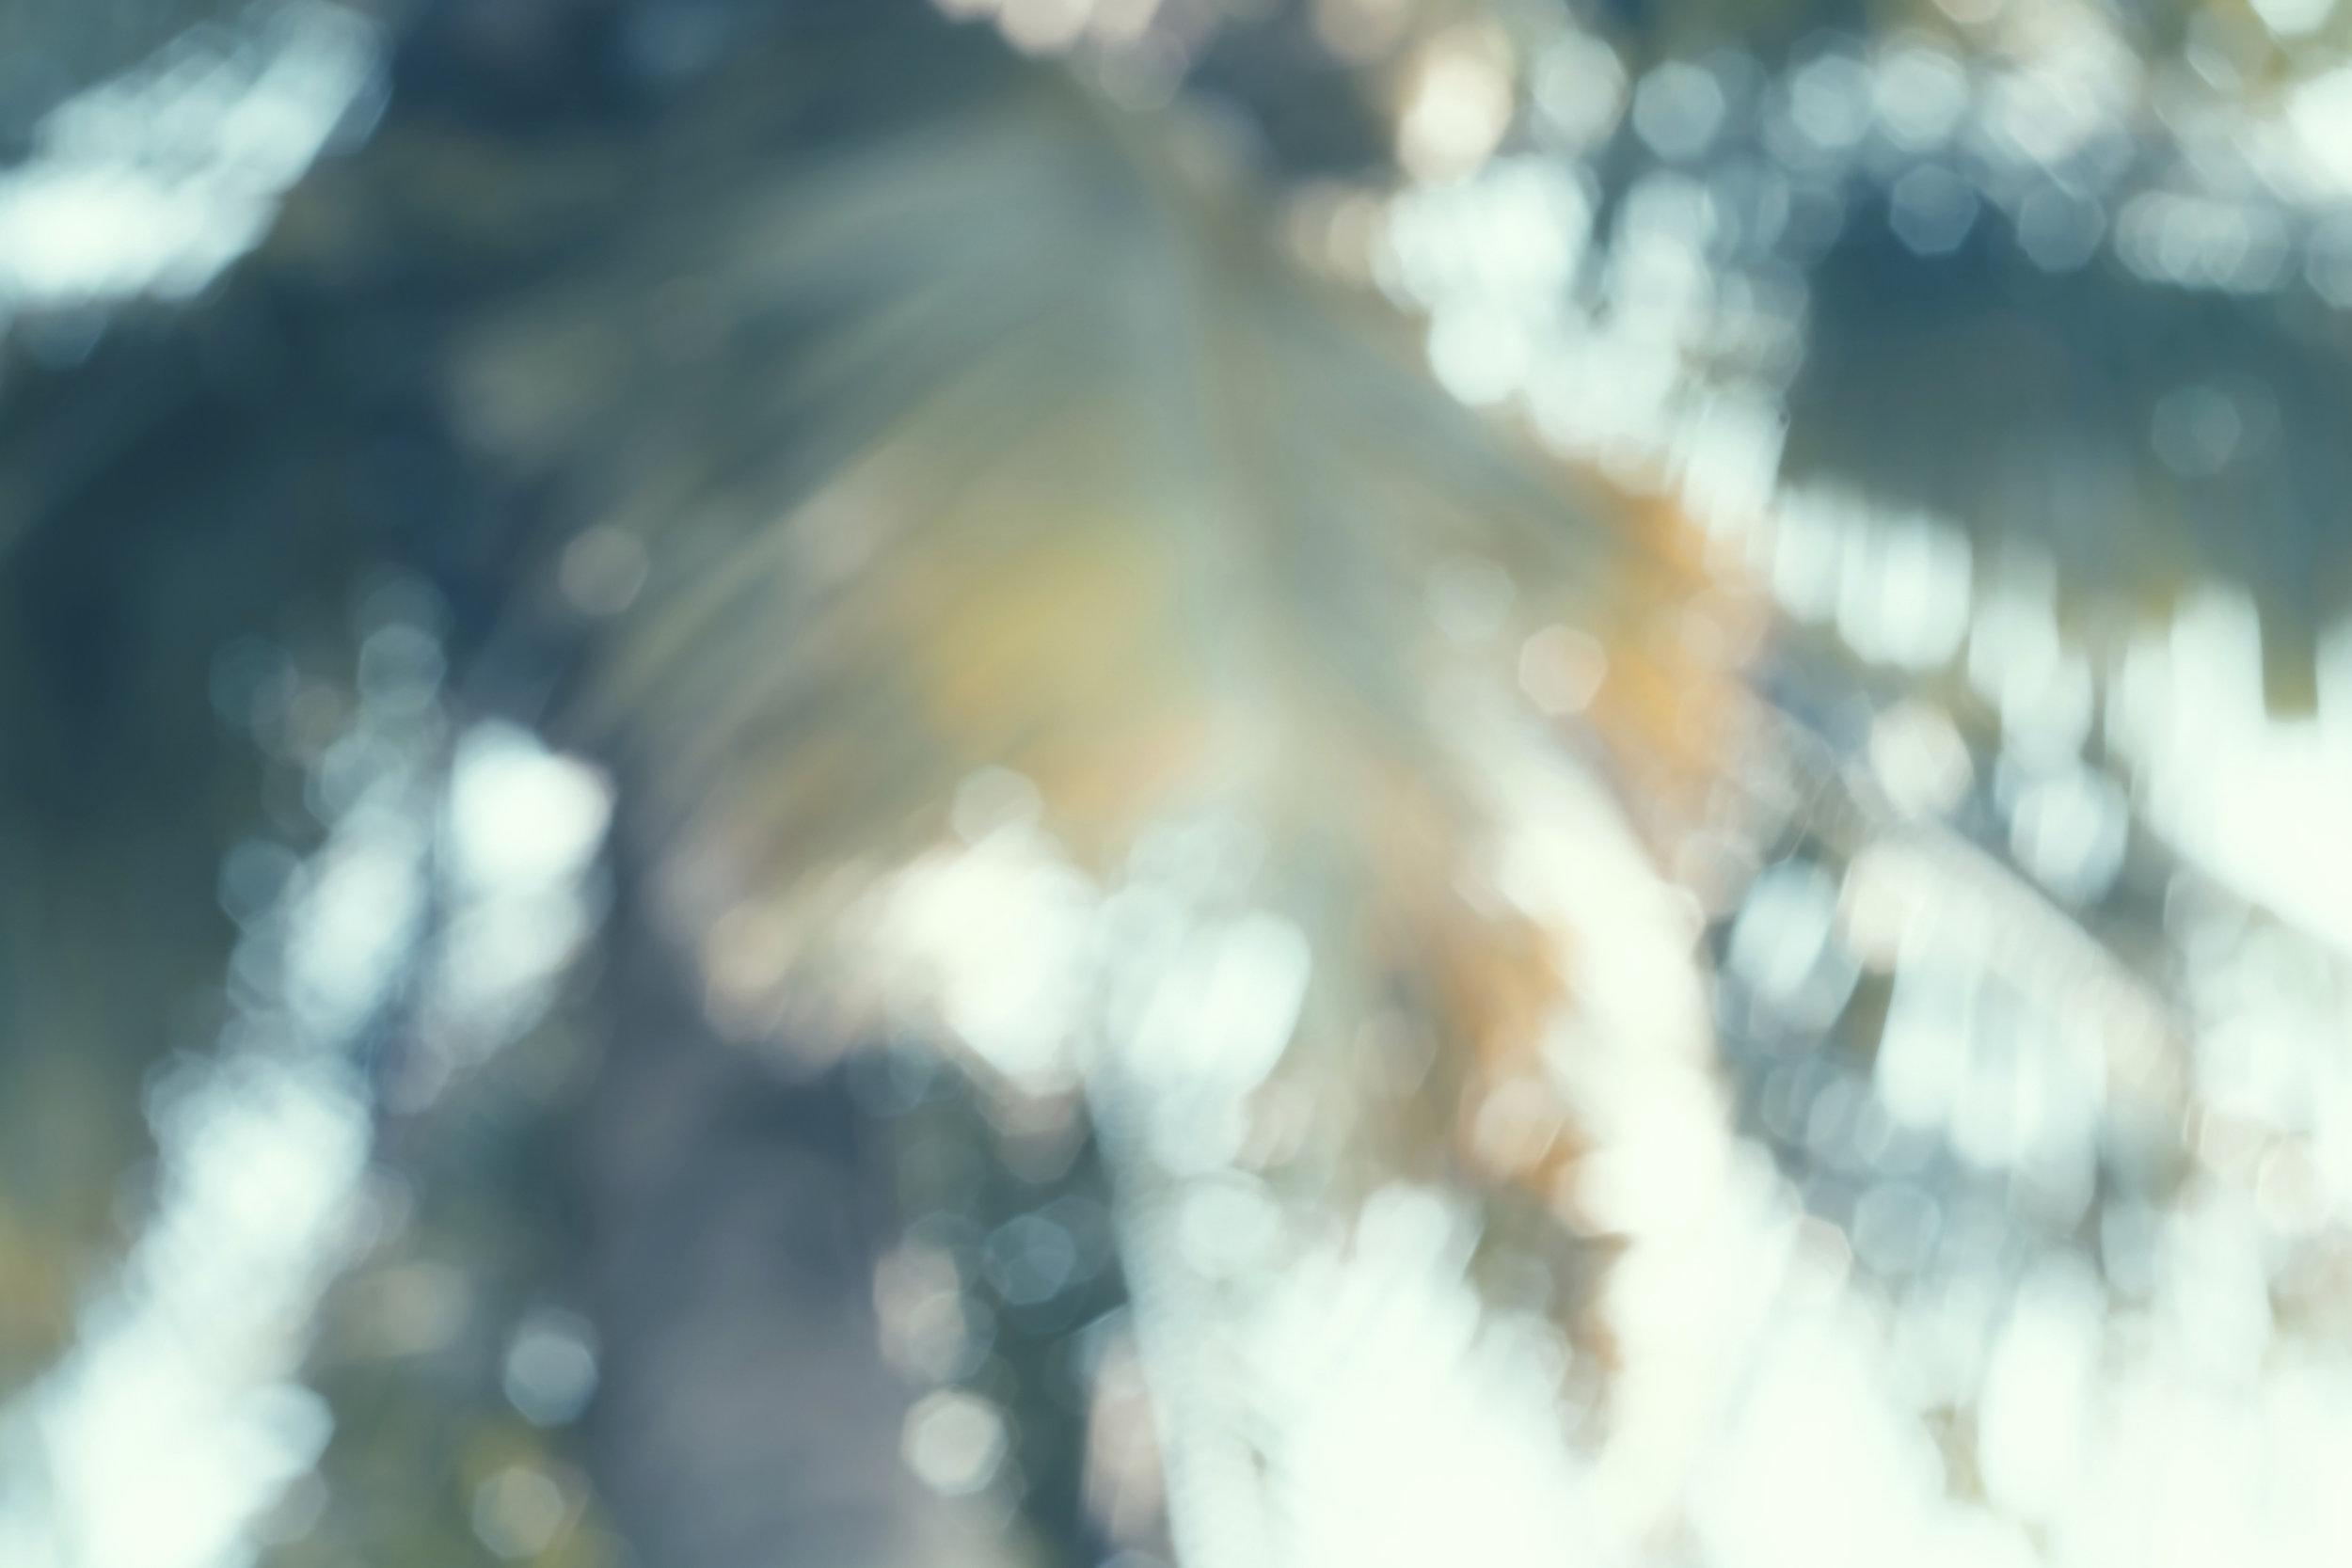 palmsblurry.jpg